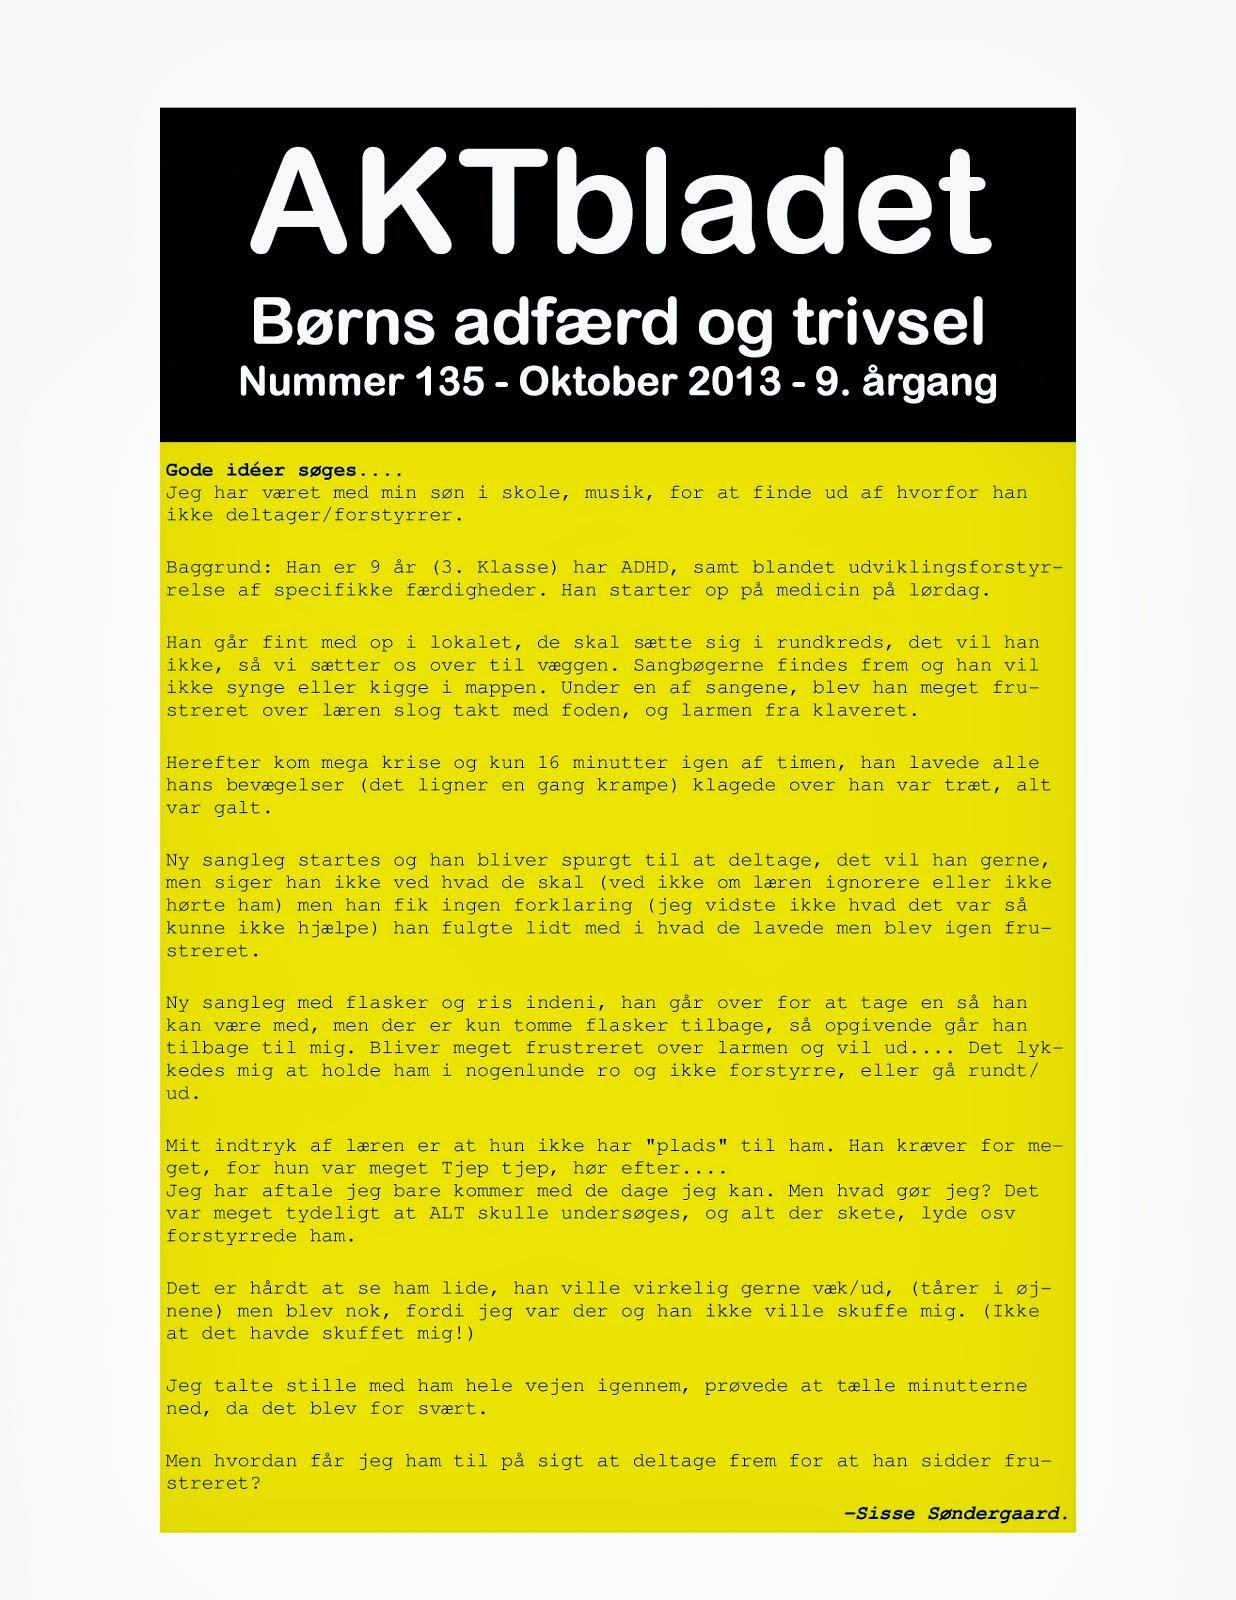 AKTblad #135